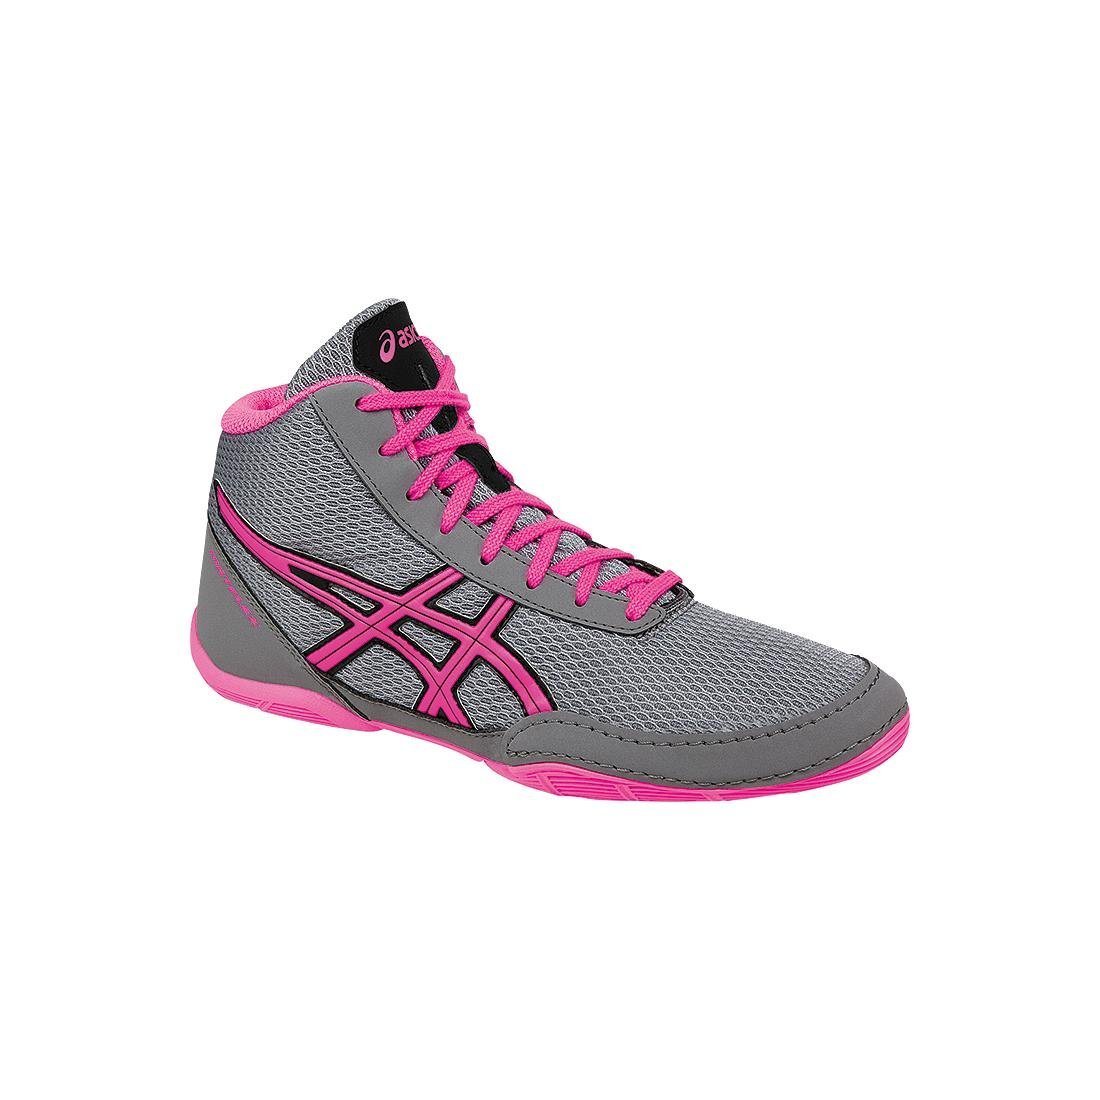 ASICS Matflex 5 GS Skate Shoe (Little Kid/Big Kid), Aluminum/Hot Pink/Black, 11 by ASICS